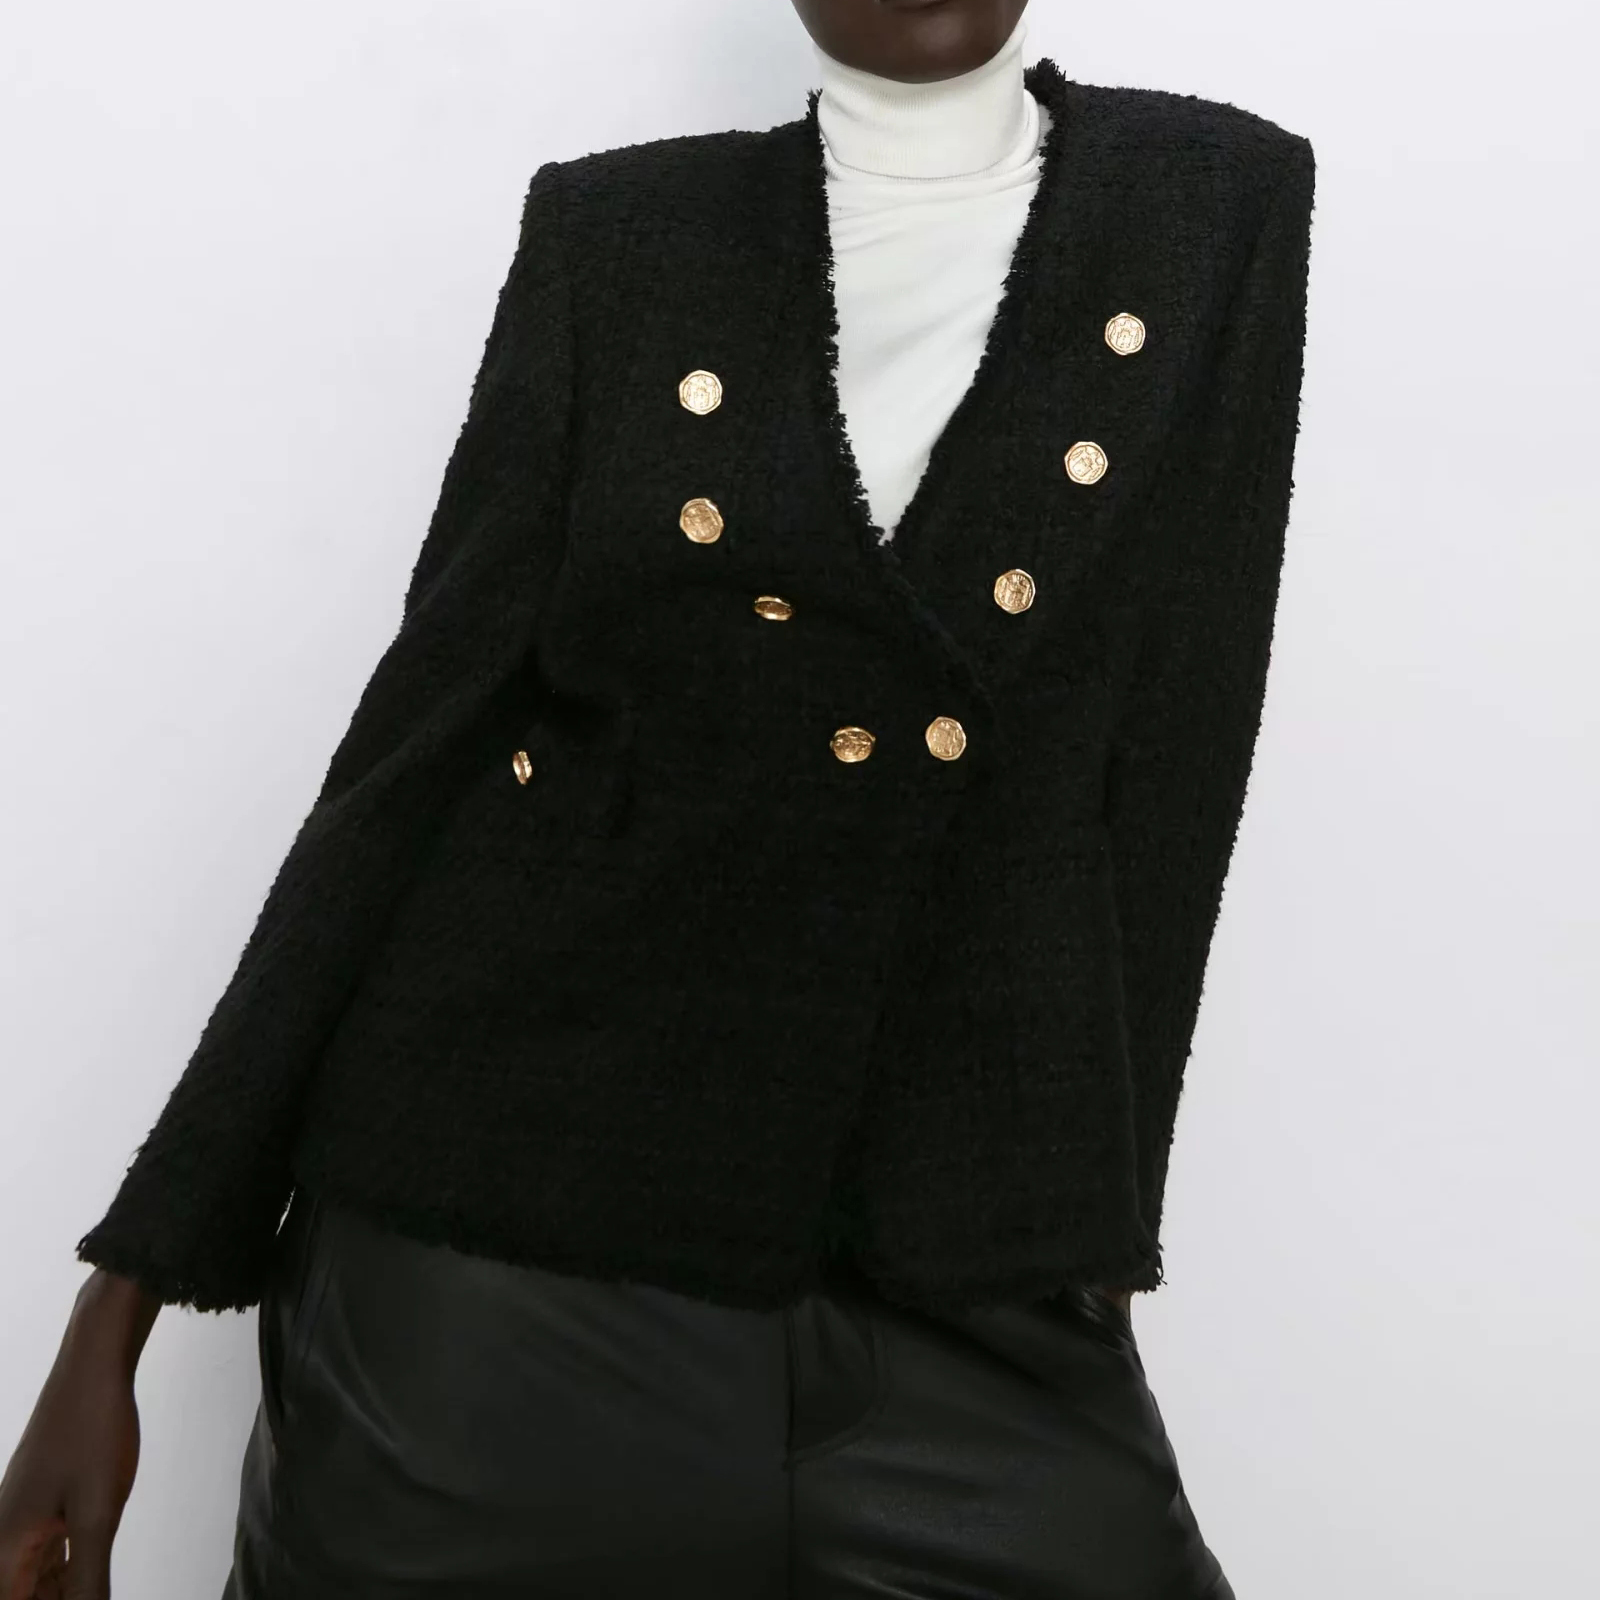 2019 Autumn Women's Suit  Casual Vintage Chic Coat Tweed Jacket Female Double Button Wool Blazer Outerwear Women ZA Style